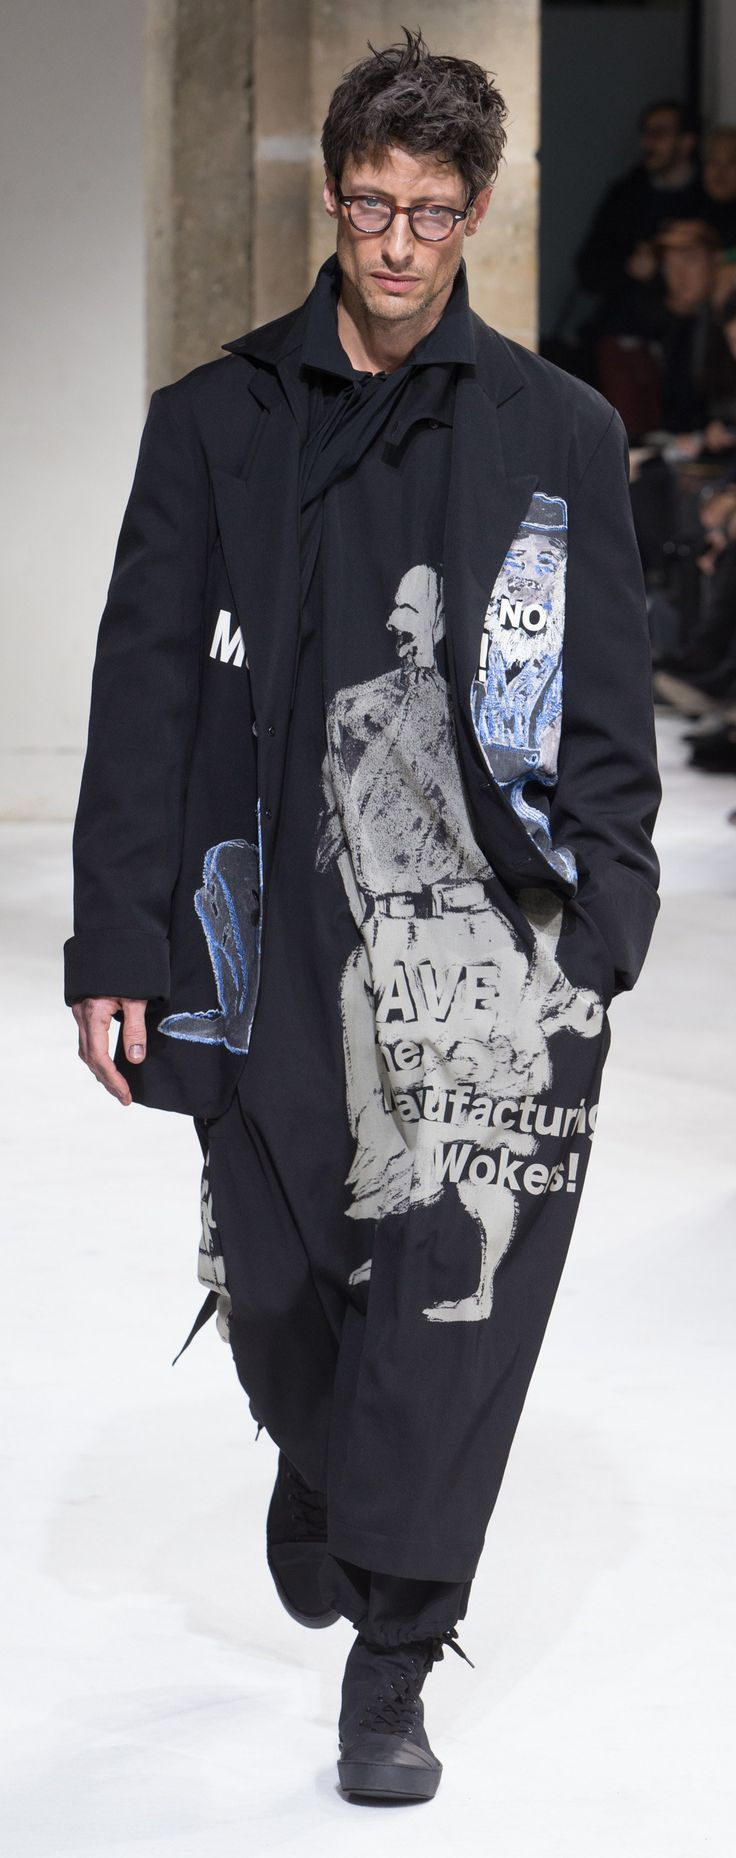 Yohji Yamamoto - Fall 2017 http://www.99wtf.net/men/mens-fasion/dressing-styles-girls-love-guys-shirt-included/